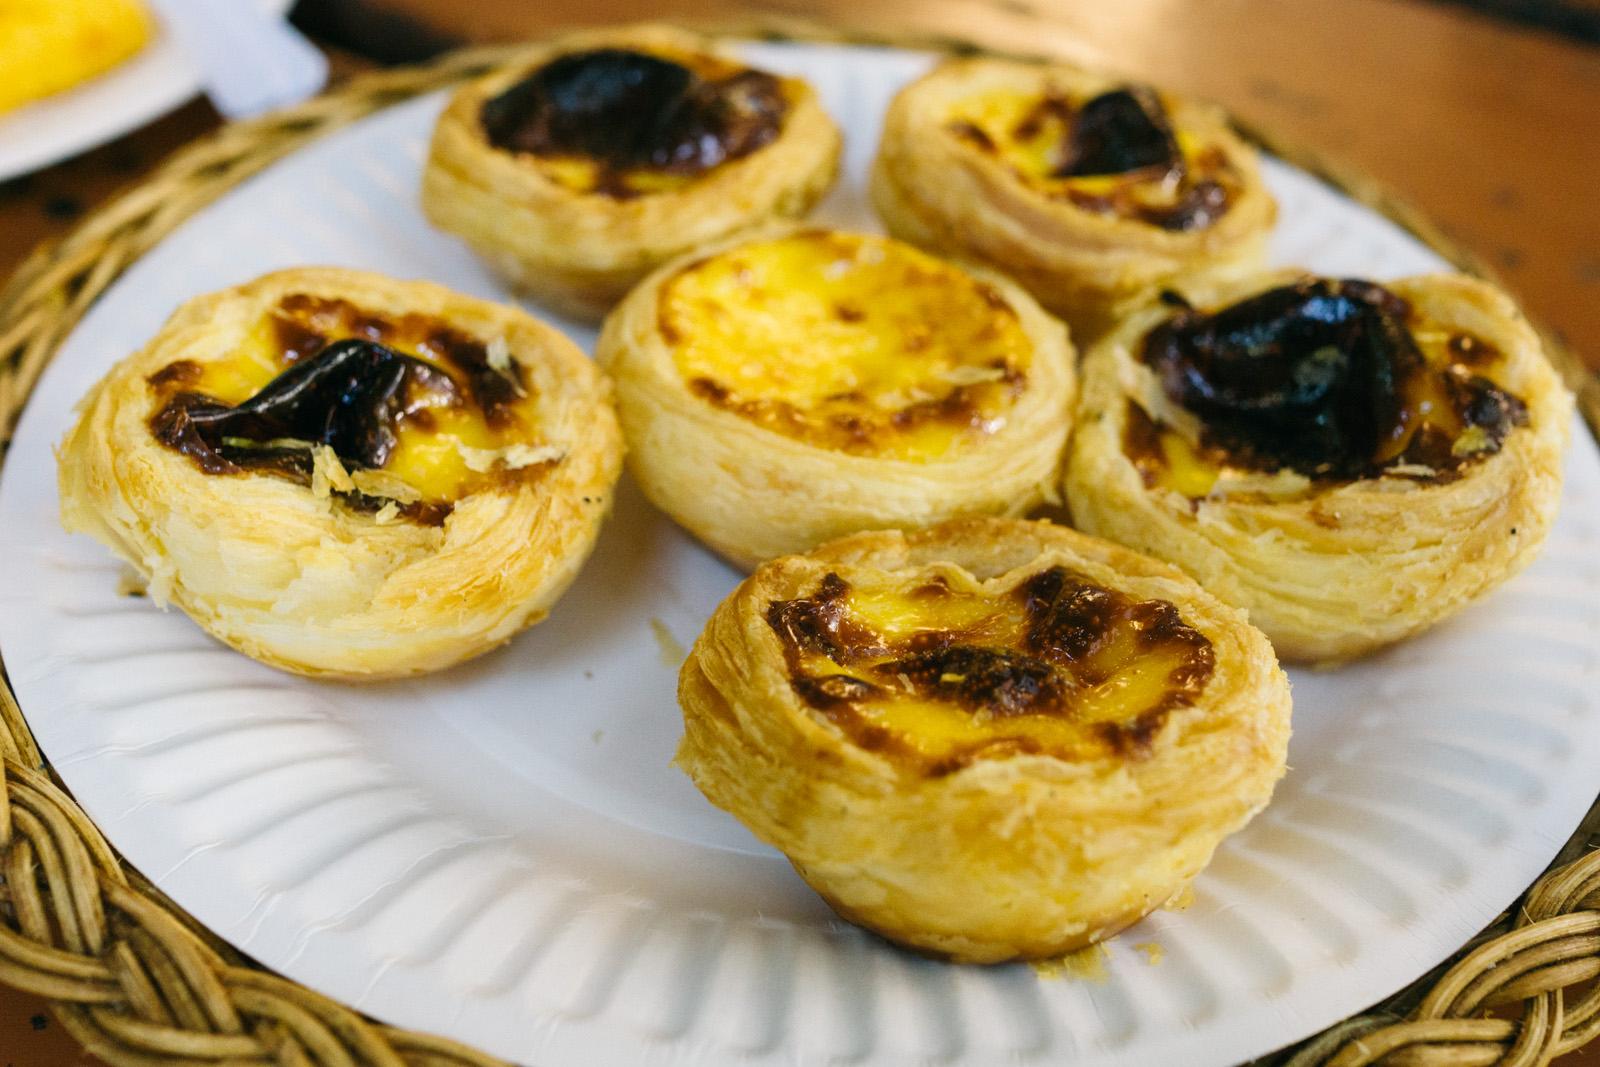 that-food-cray-margarets-cafe-e-nata-macau-portuguese-egg-tarts-9